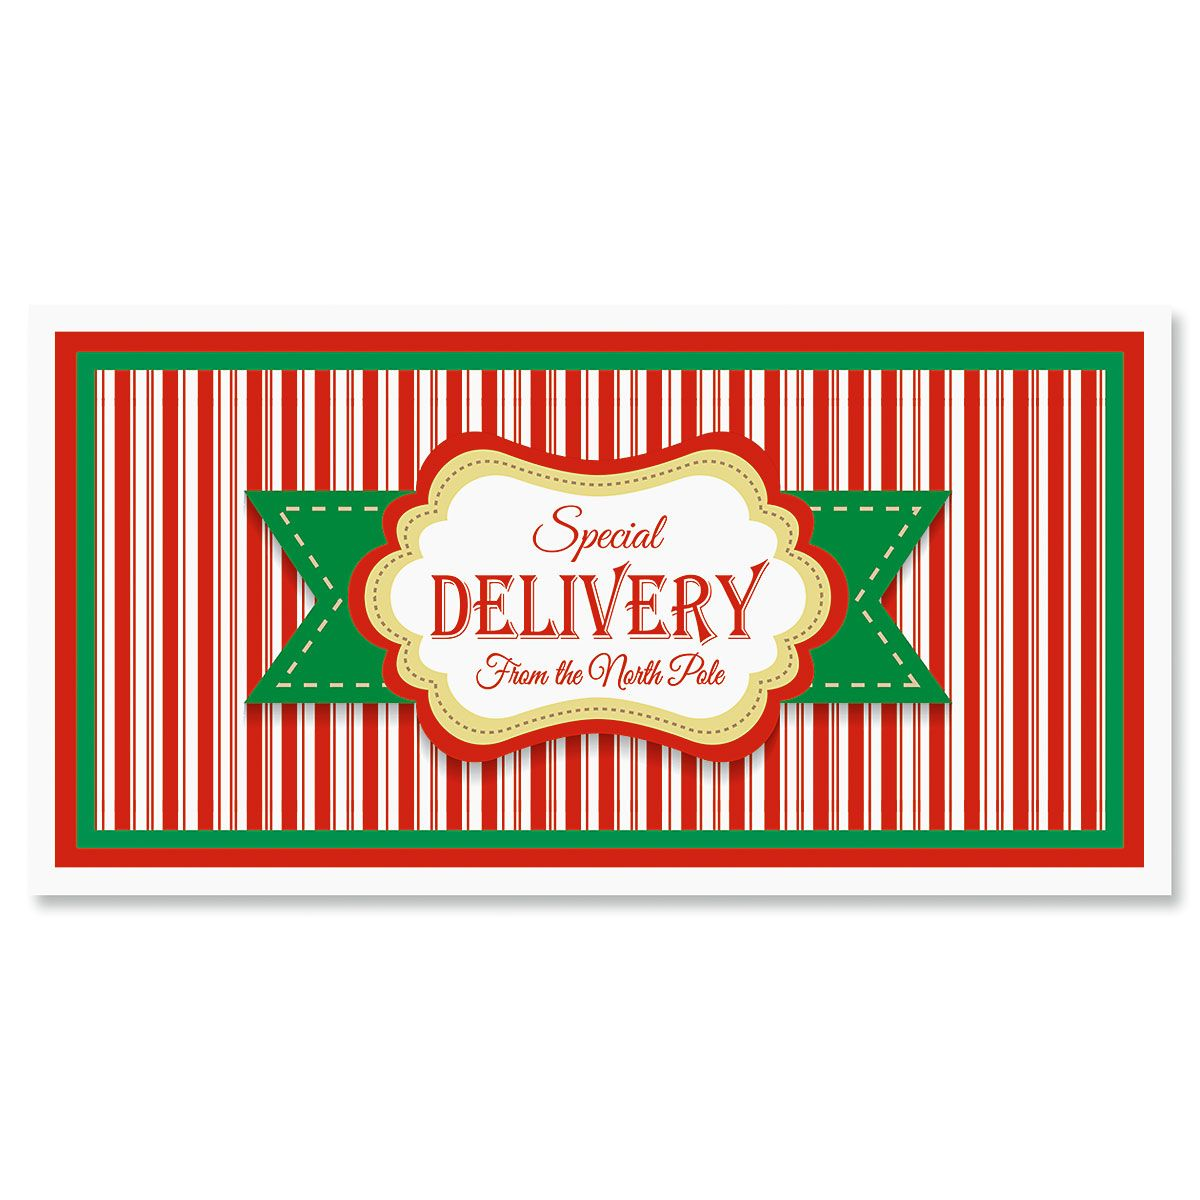 North Pole Special Delivery Envelopes